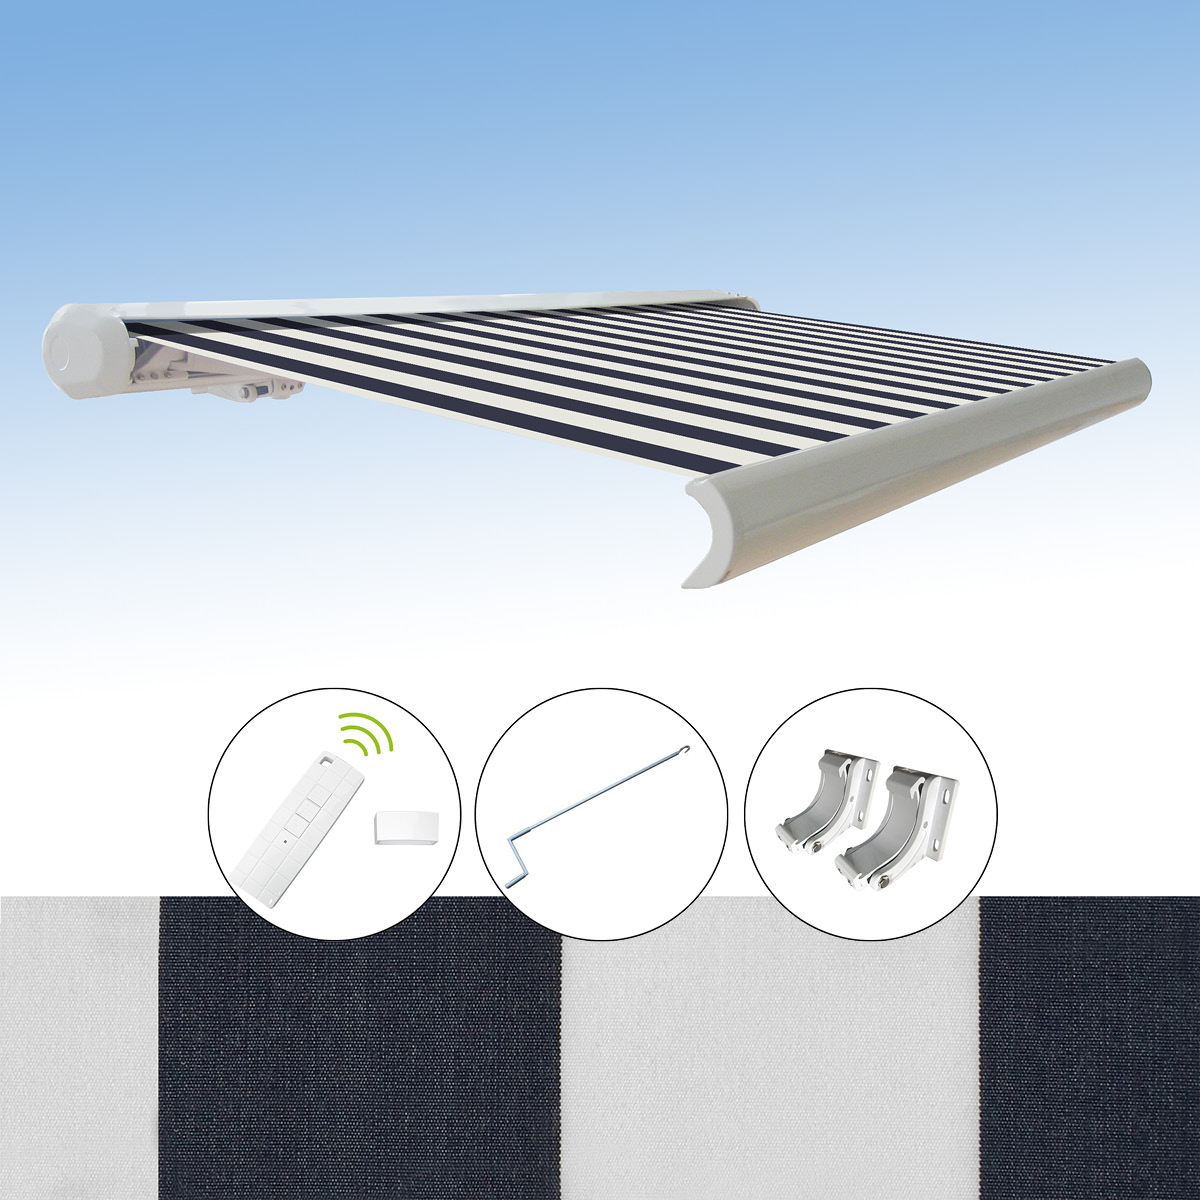 kassettenmarkise elektrische markise farbwahl m glich 3x2 5m funk motor pa acryl ebay. Black Bedroom Furniture Sets. Home Design Ideas